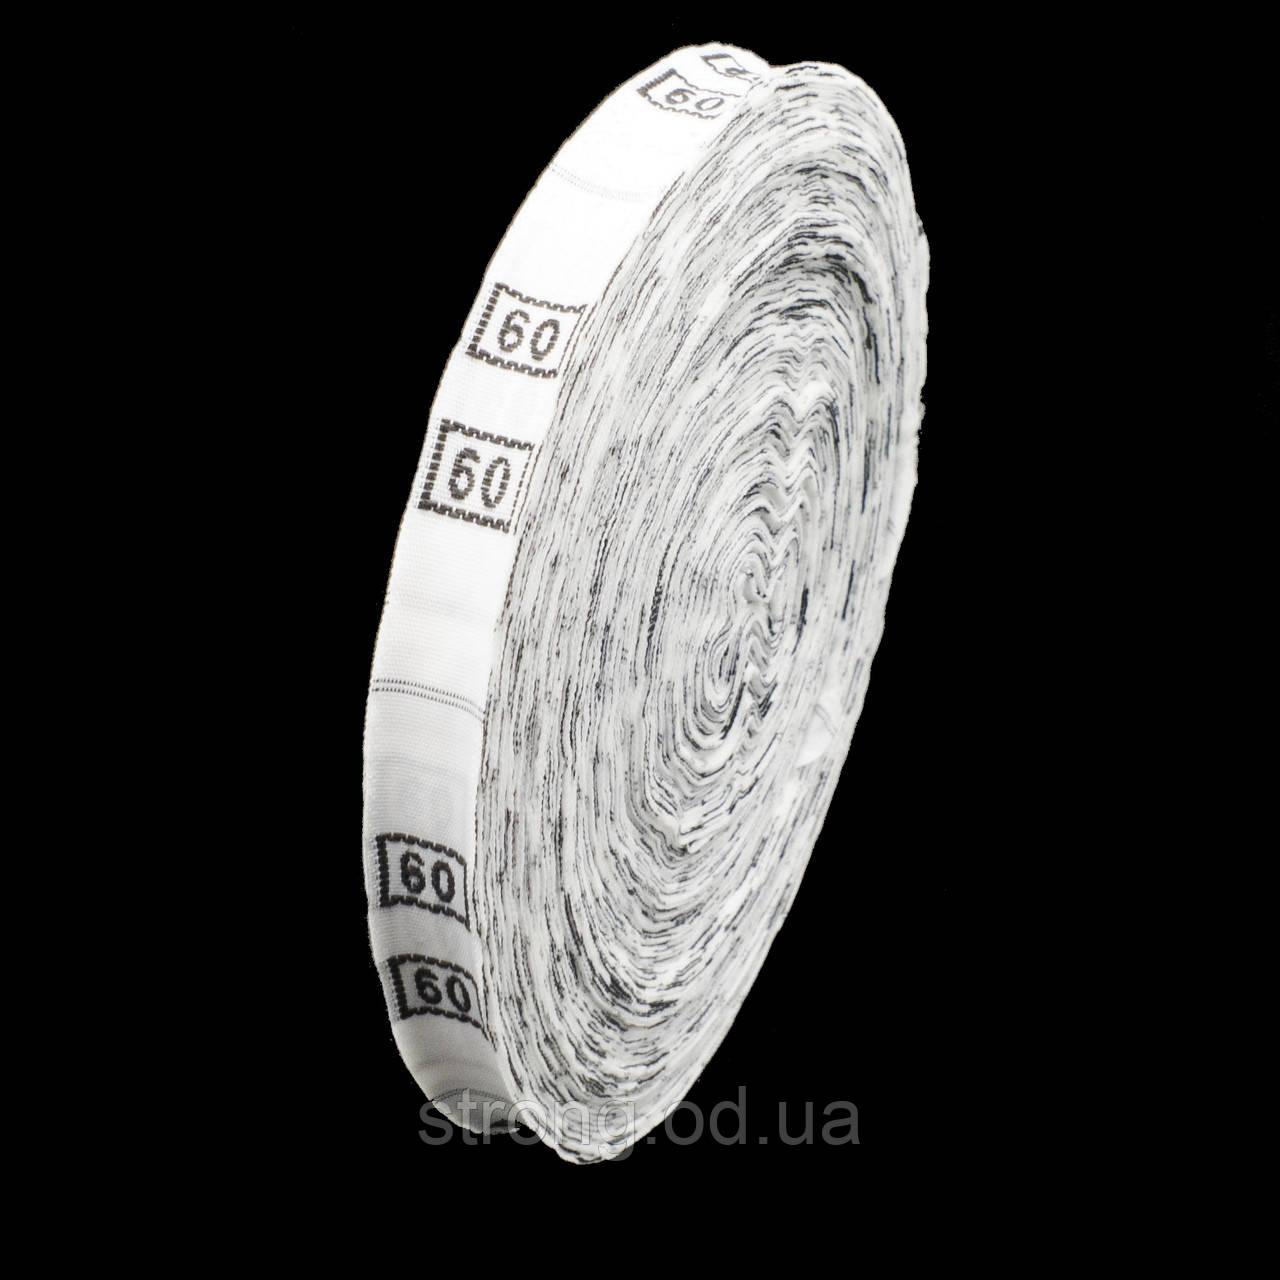 Размерник тканевый №54 960шт. Белый